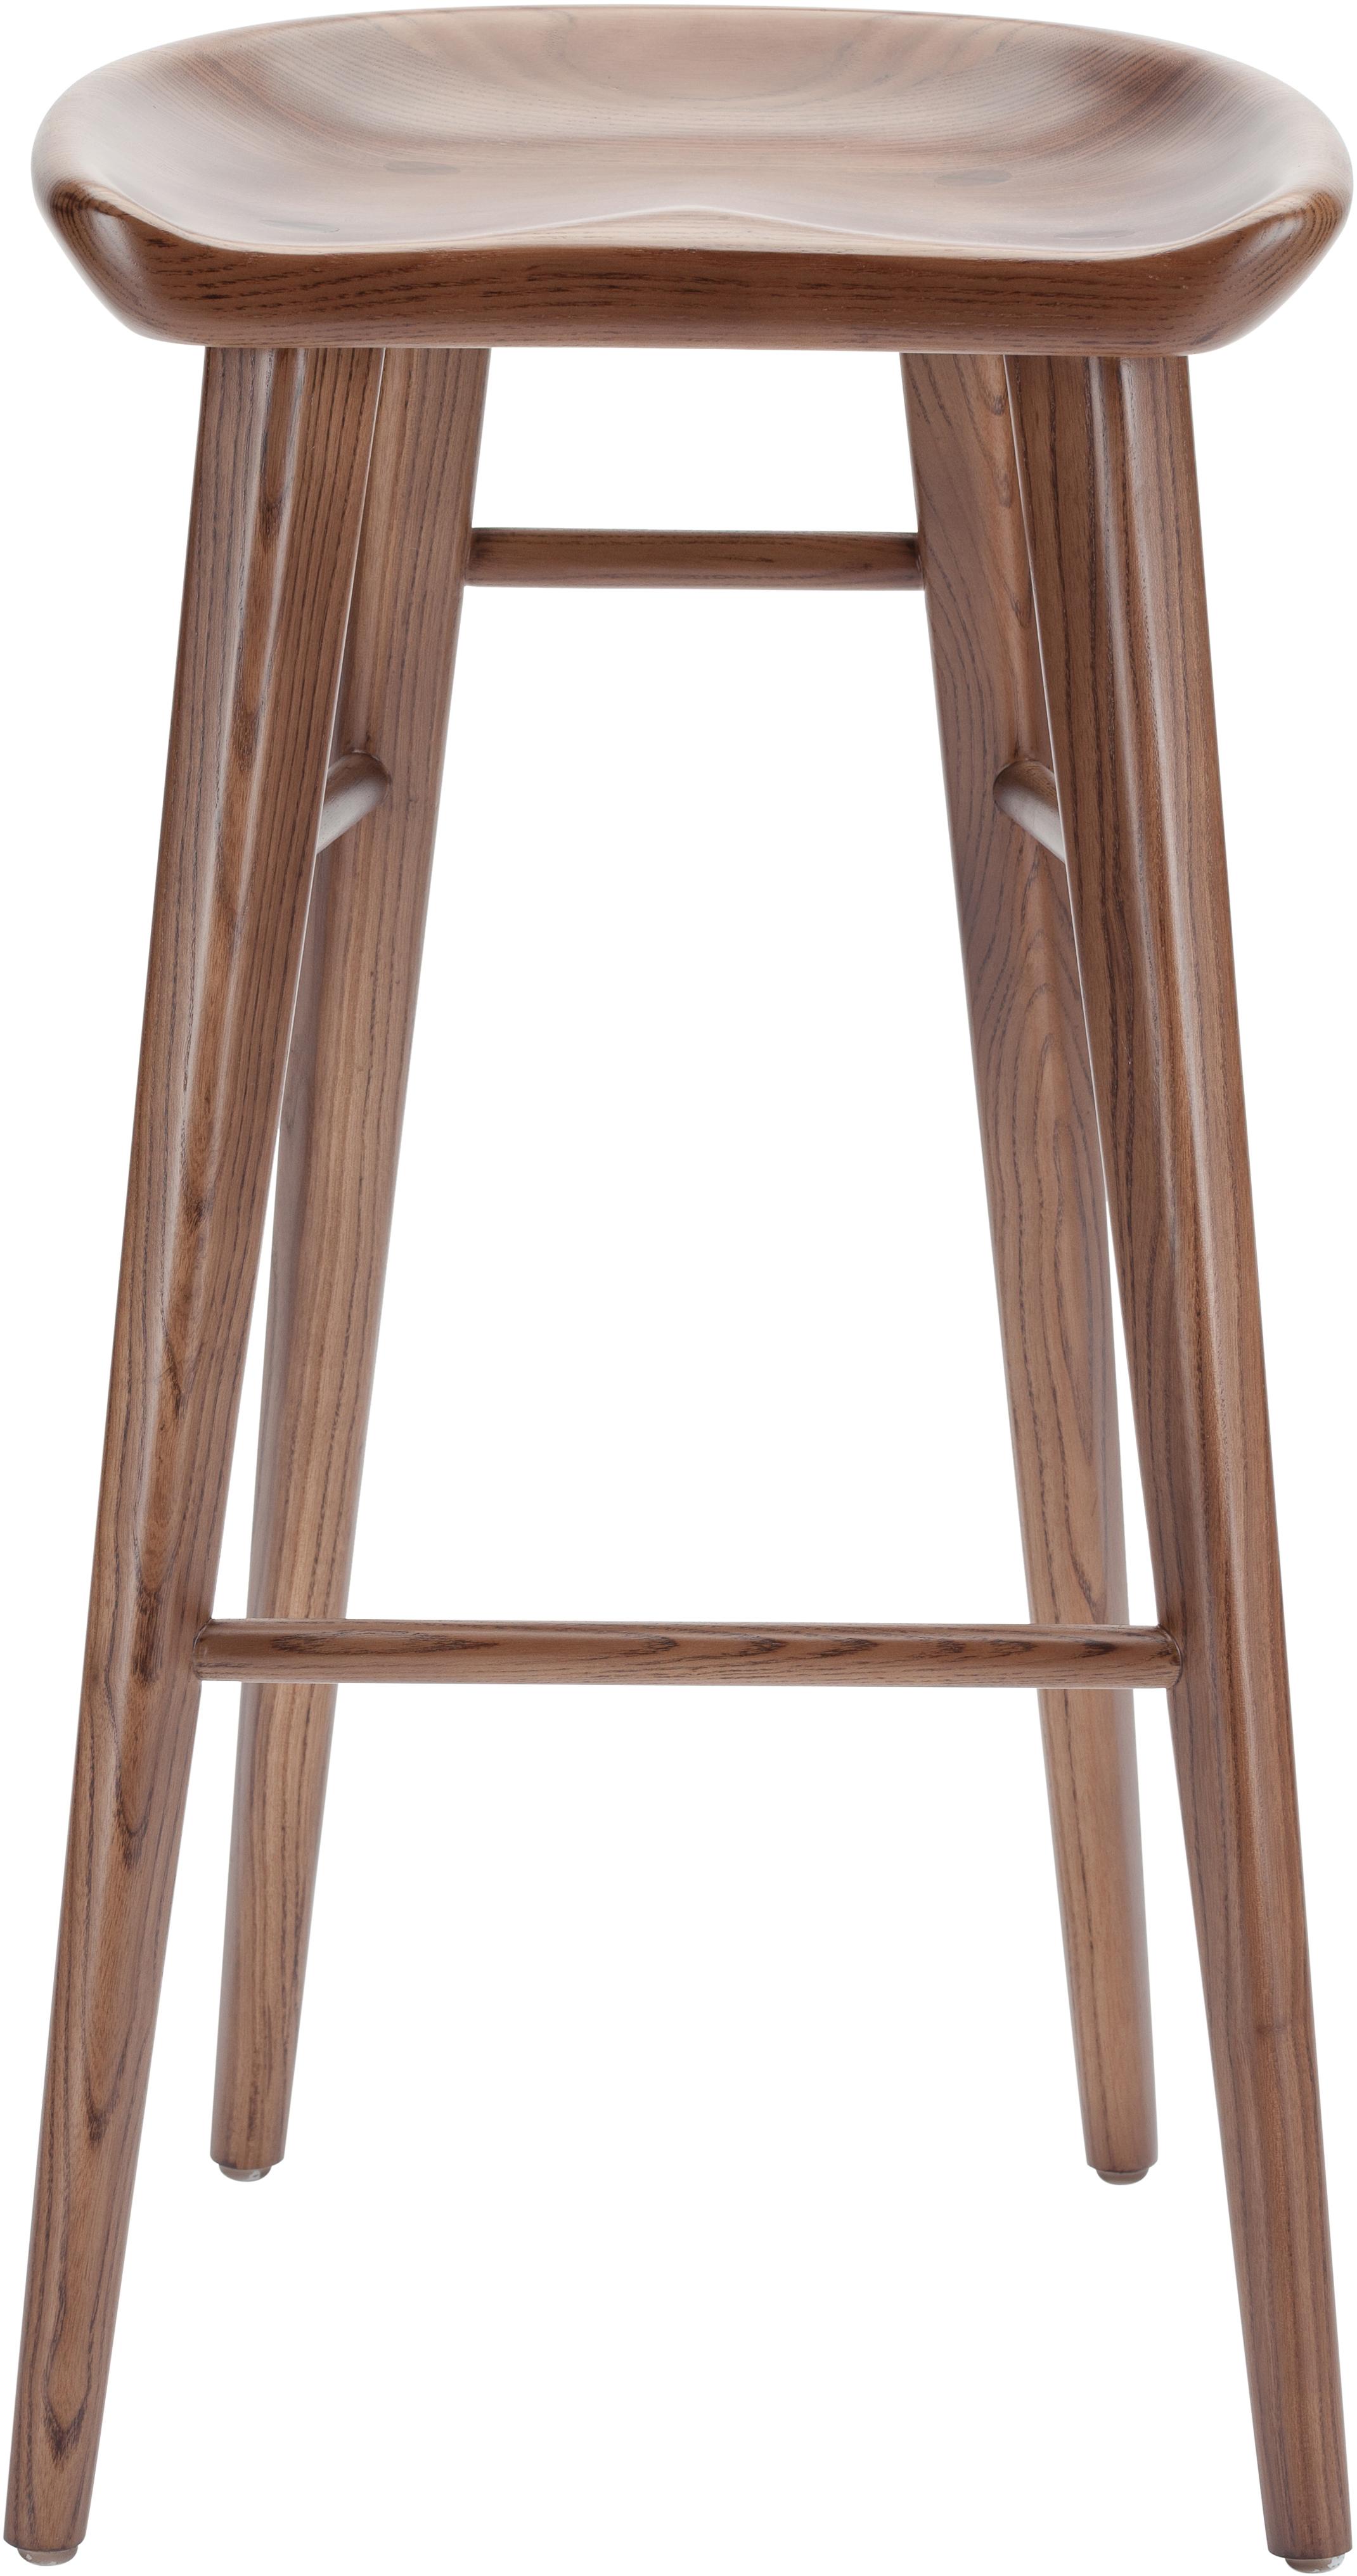 nuevo living kami stool ash stained walnut